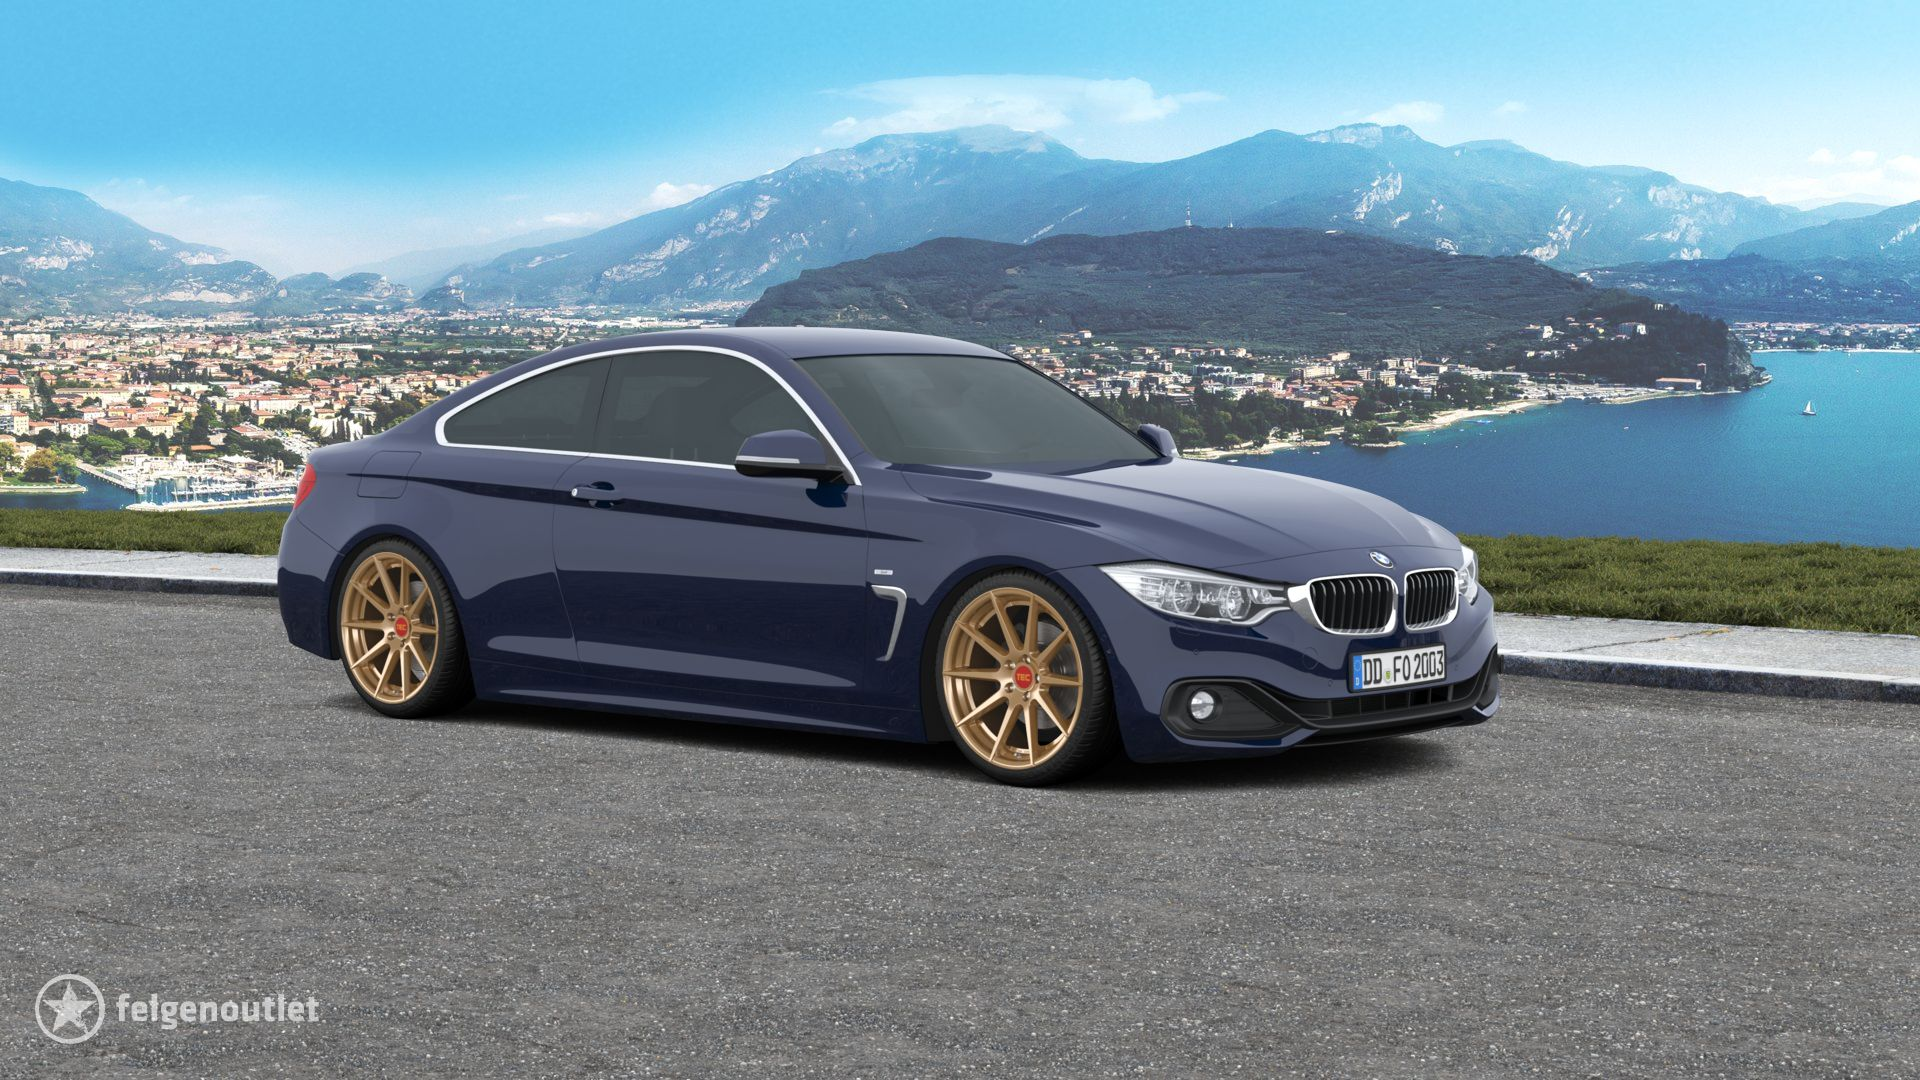 Tec Speedwheels GT-7 gold BMW 4er Reihe Coup